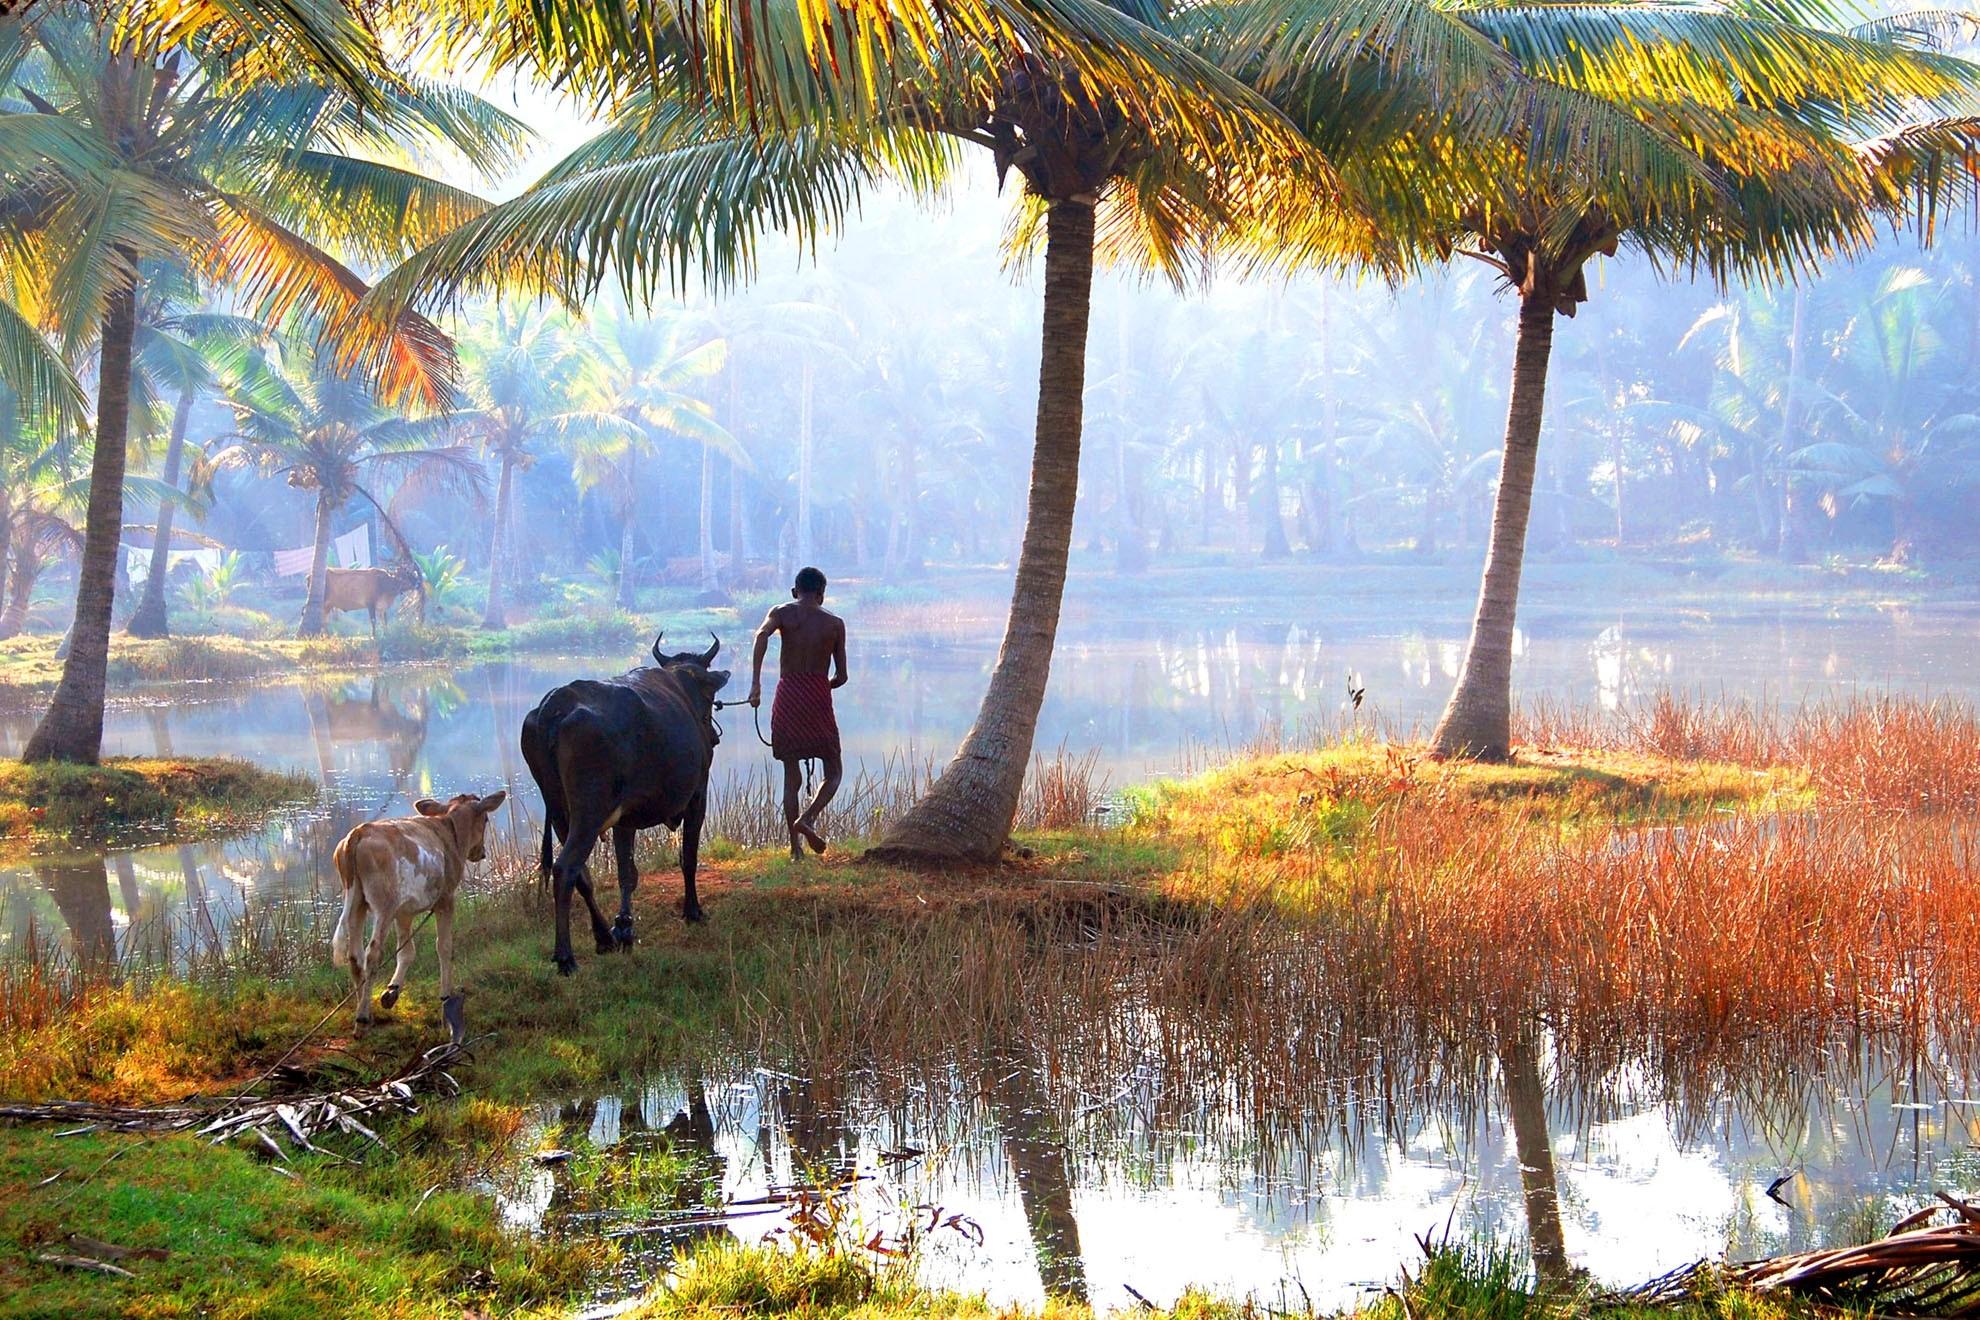 Village Life In Kerala